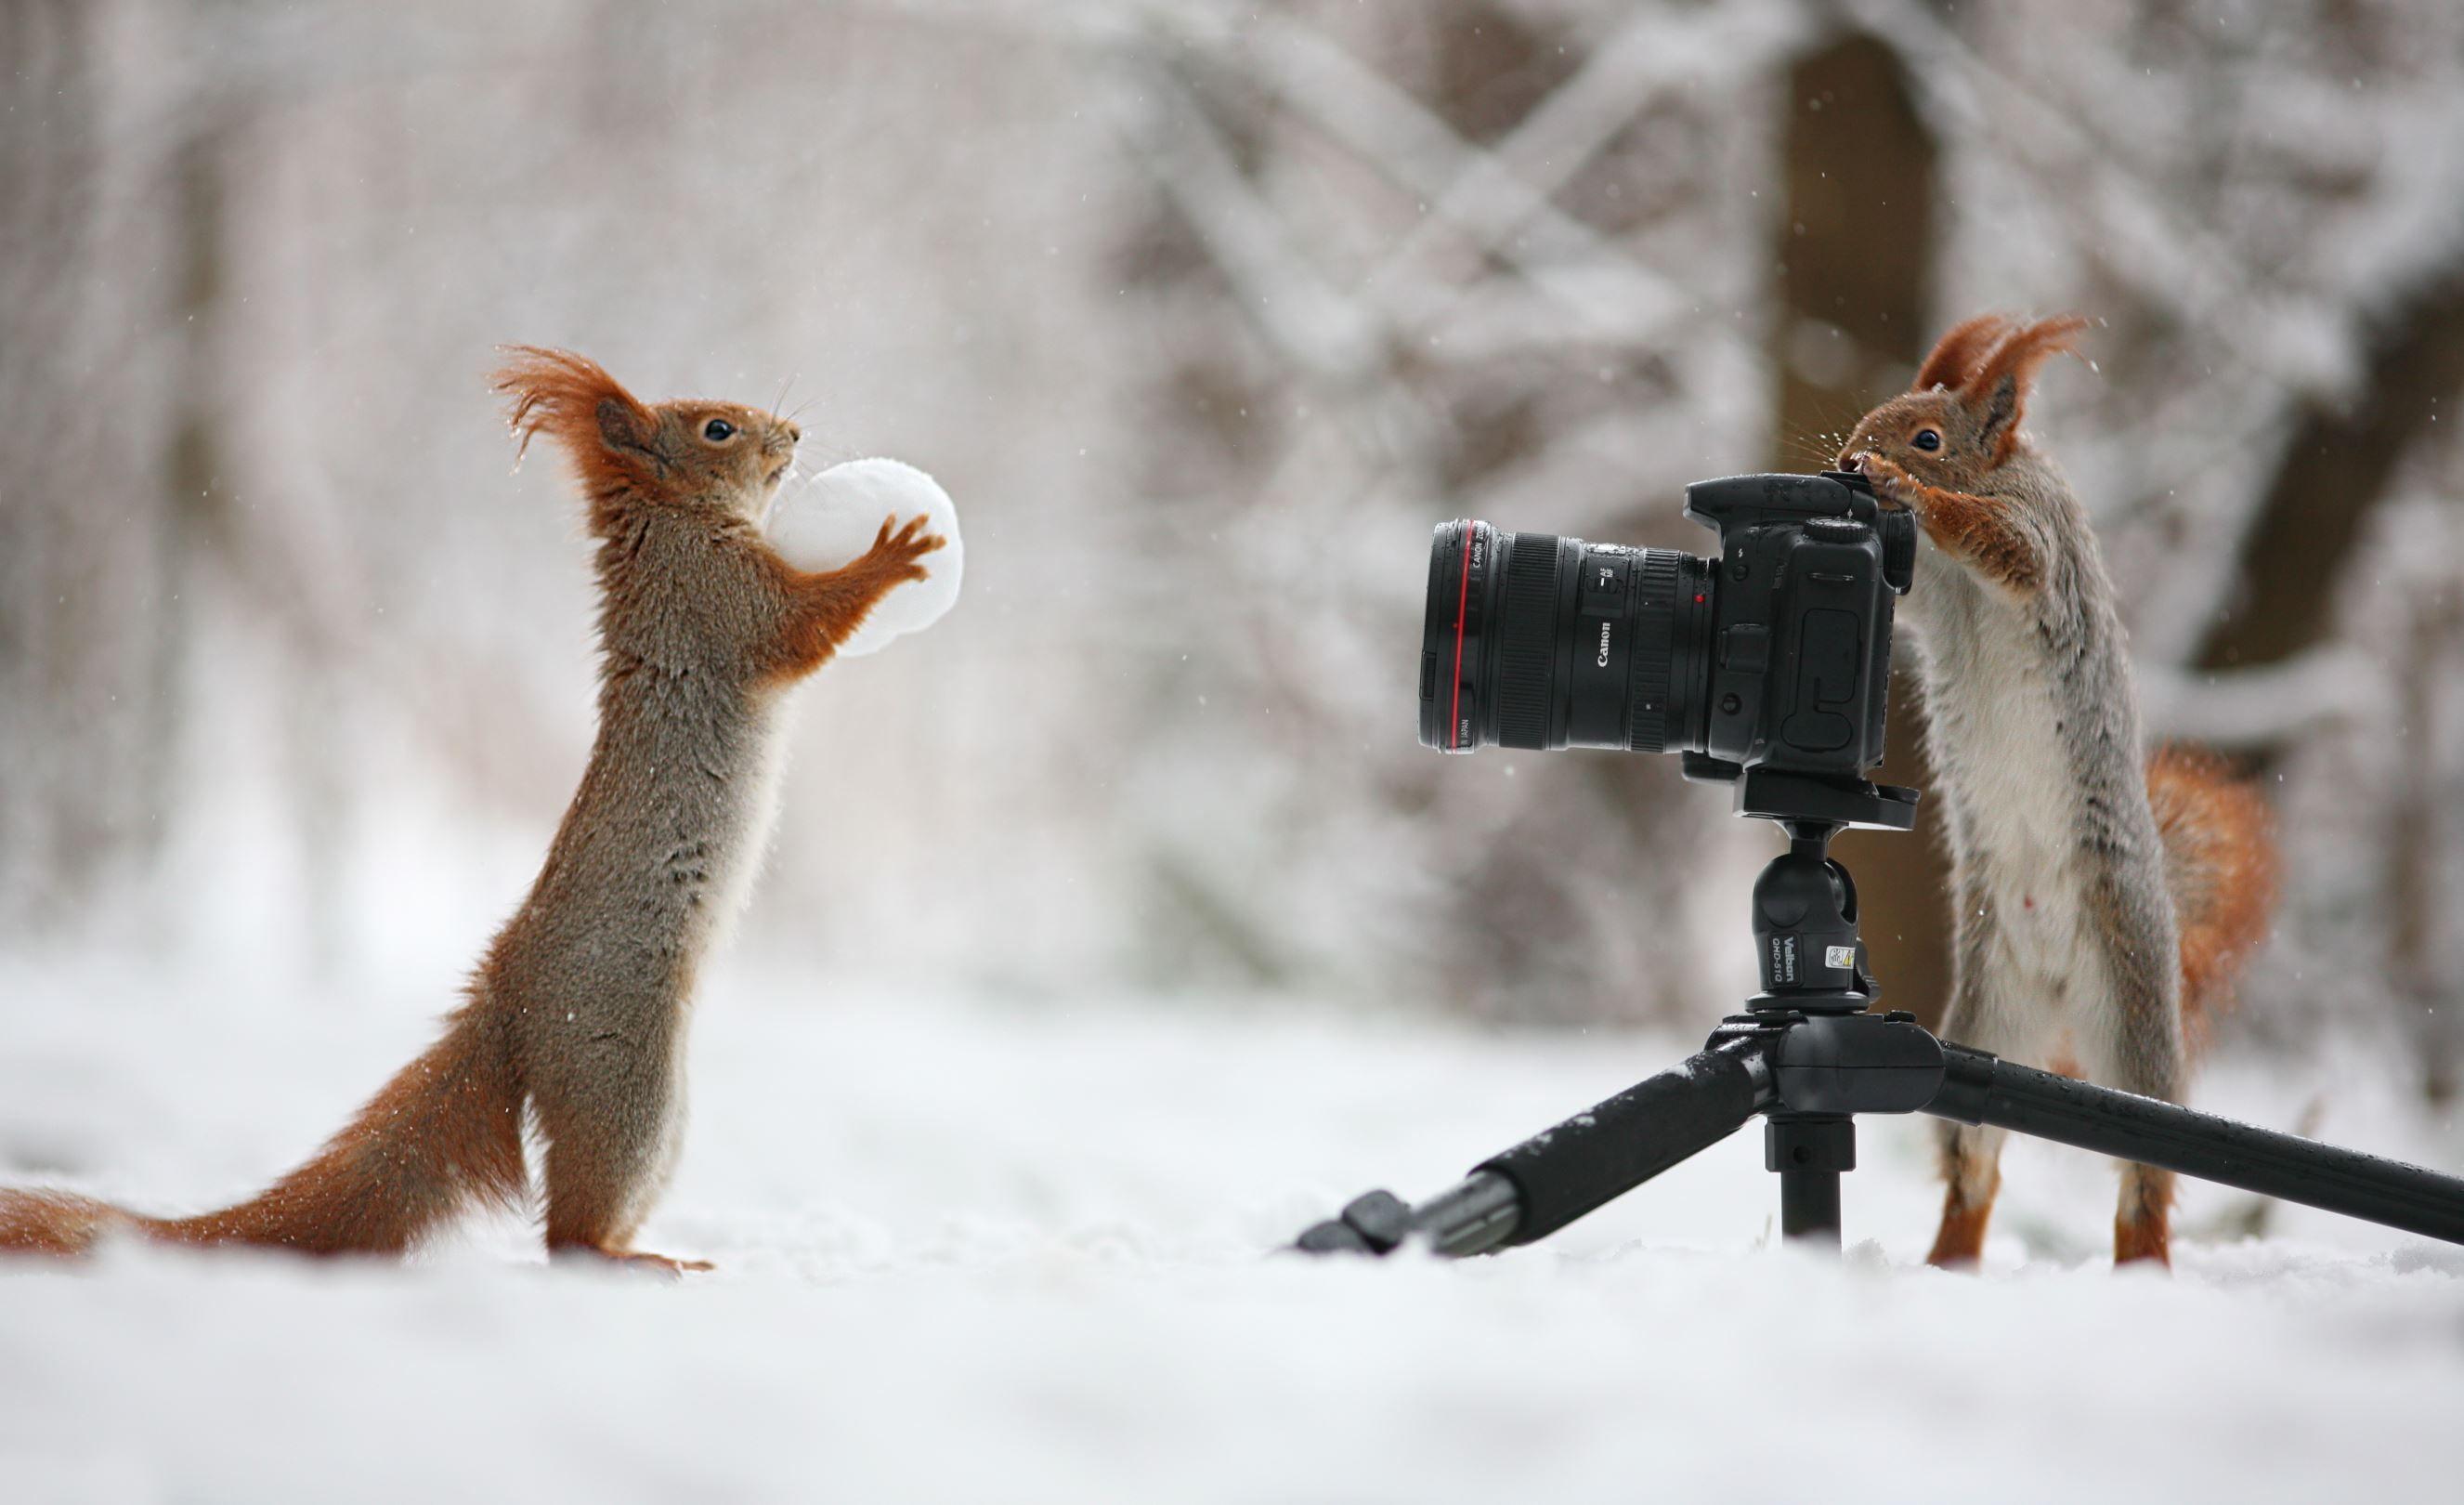 Картинка фотоаппарат смешная